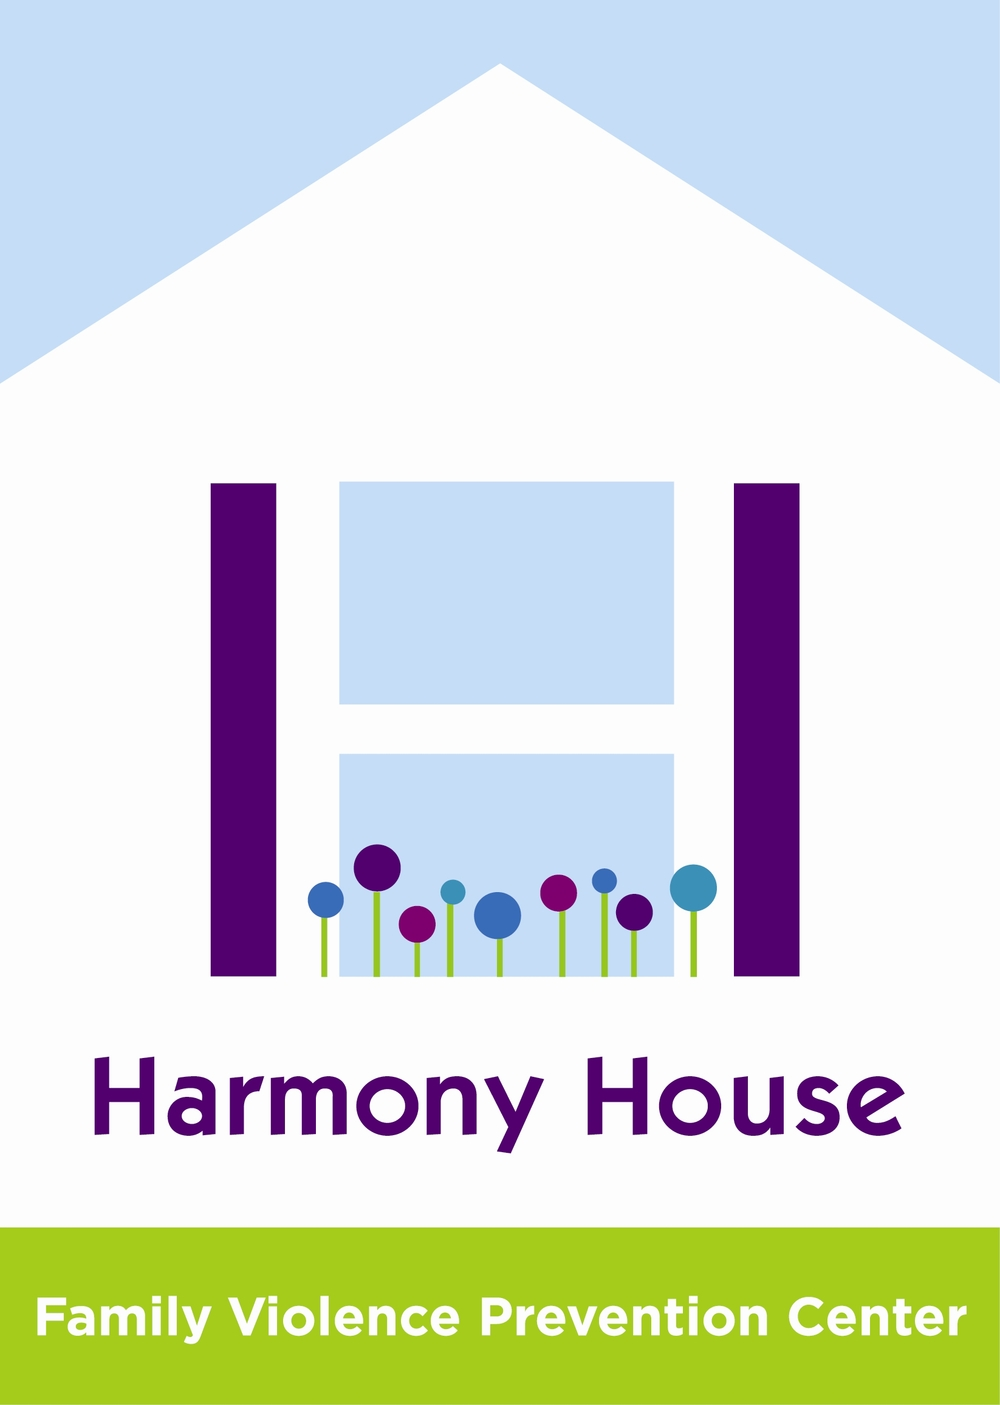 harmony_house_logo.jpg